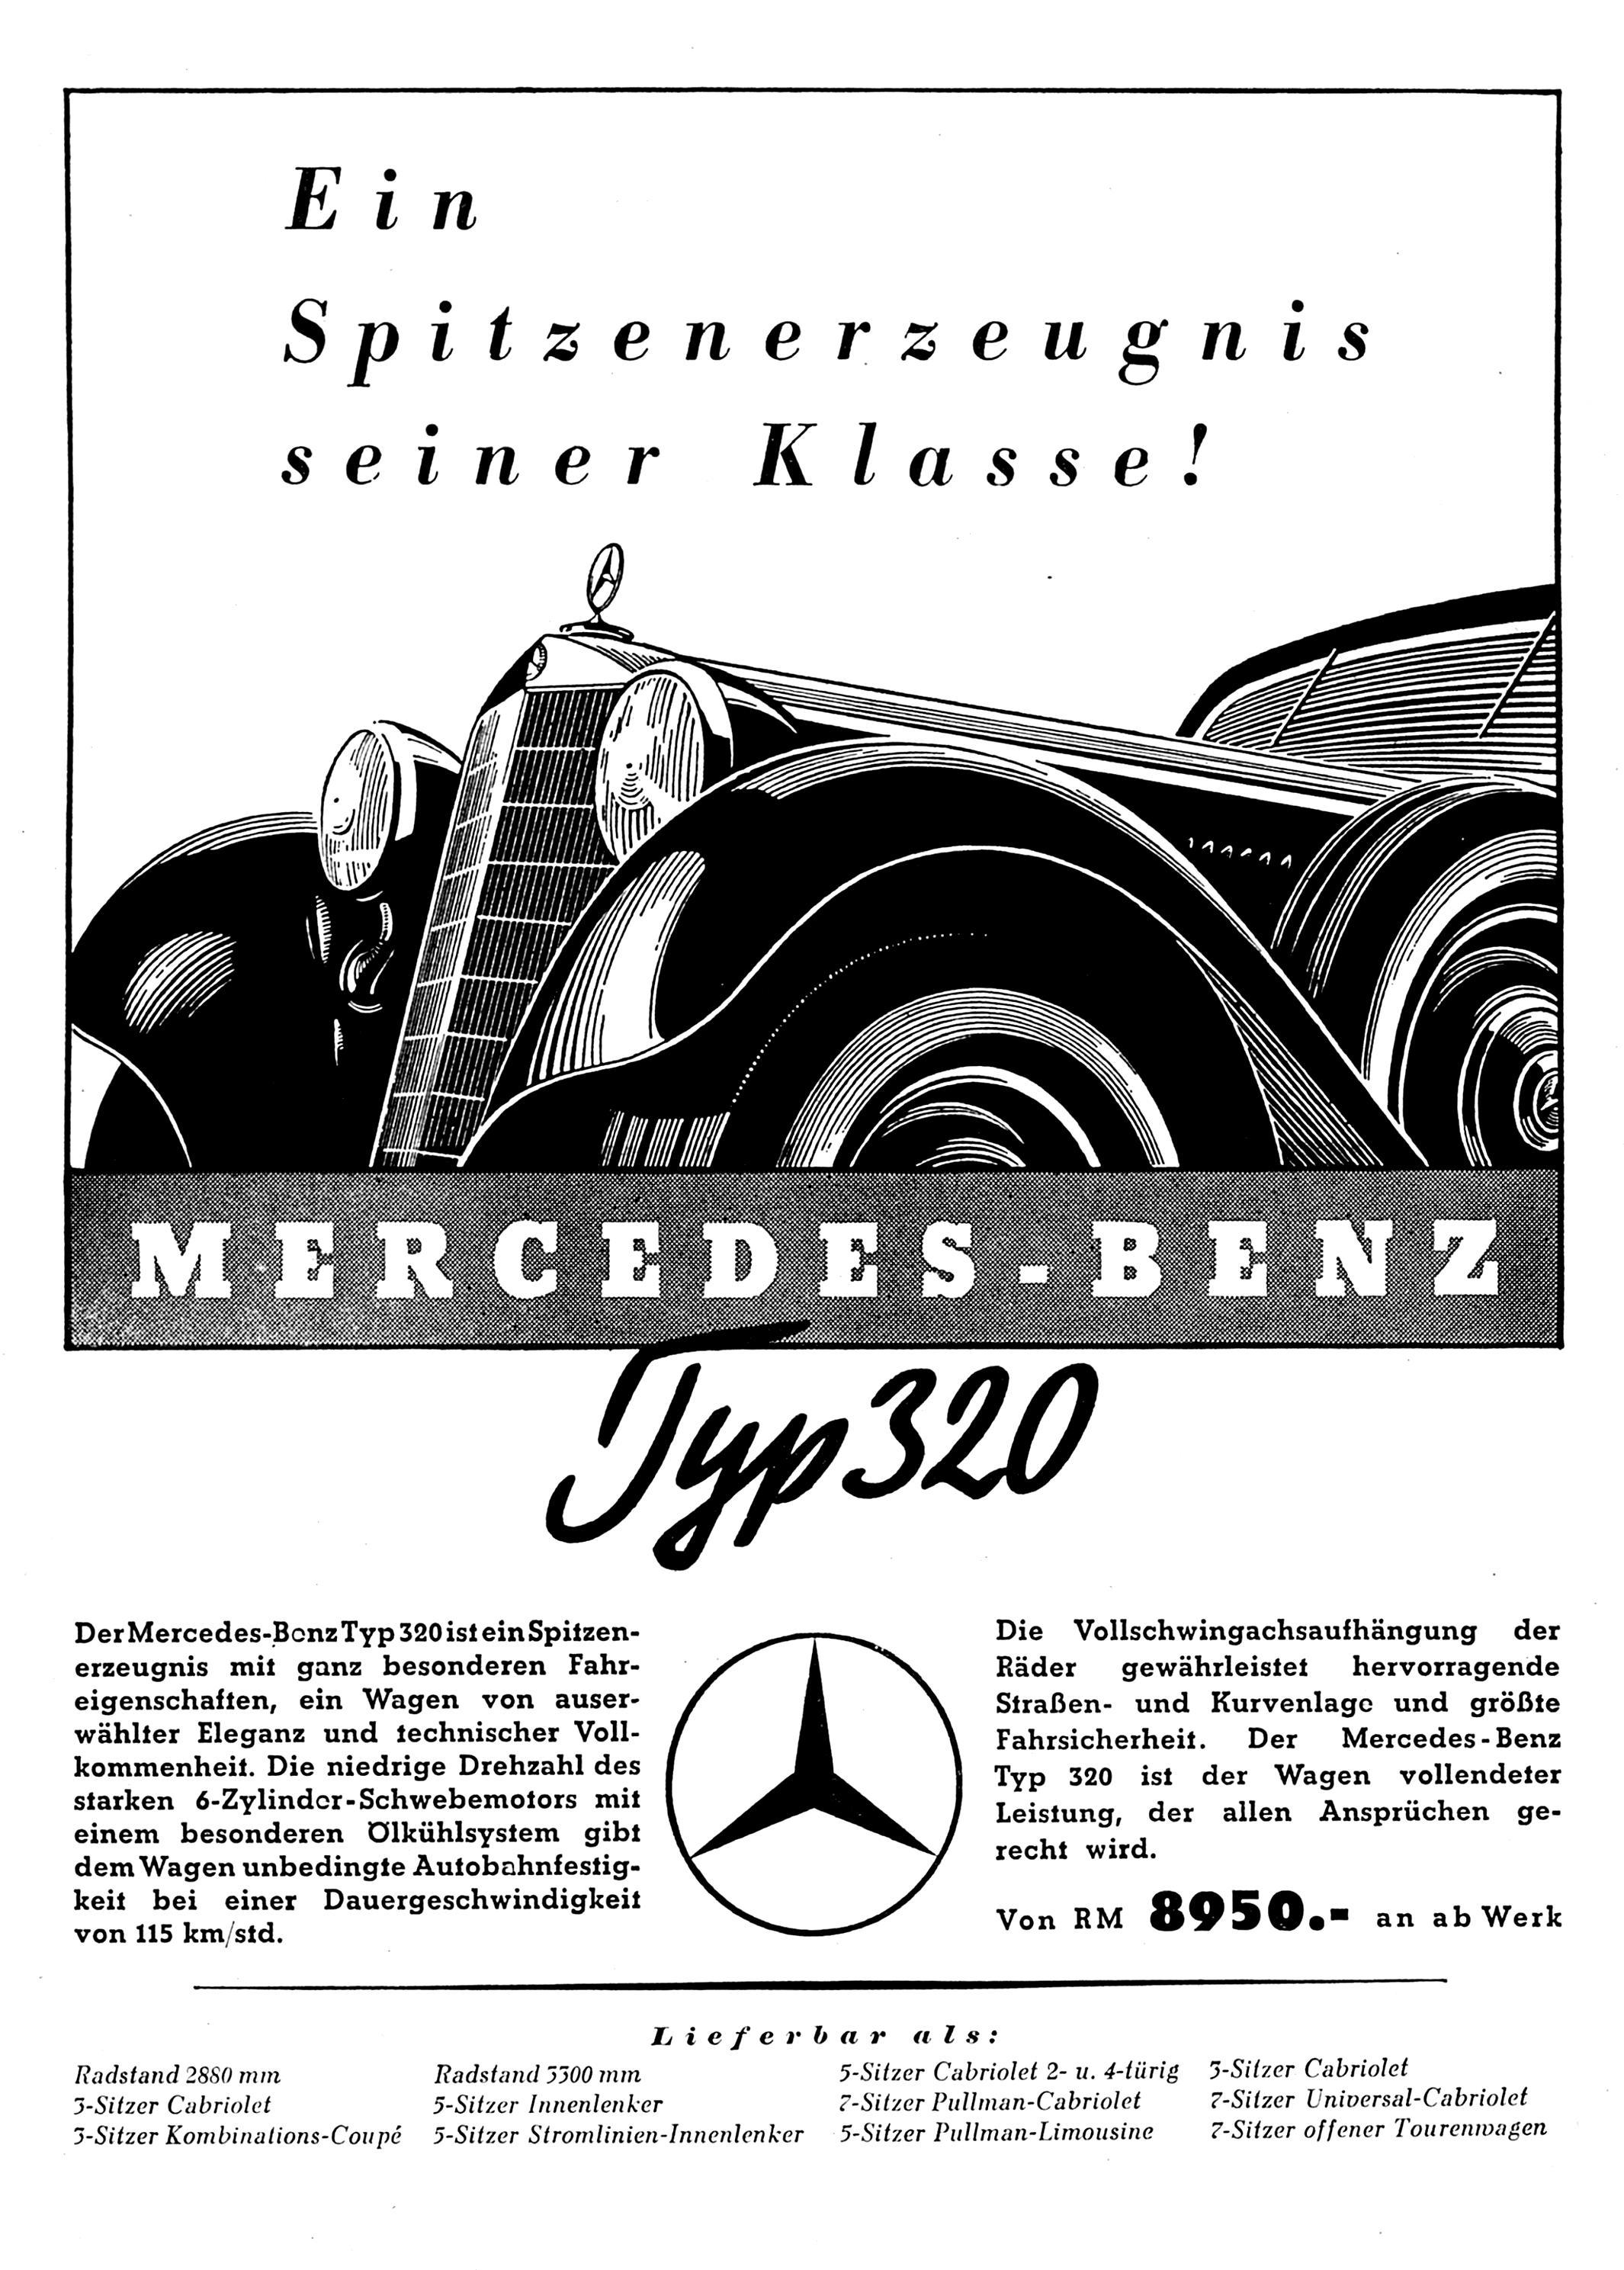 Mercedes Benz Typ 320 Pullman W142 1937 on MotoImg.com